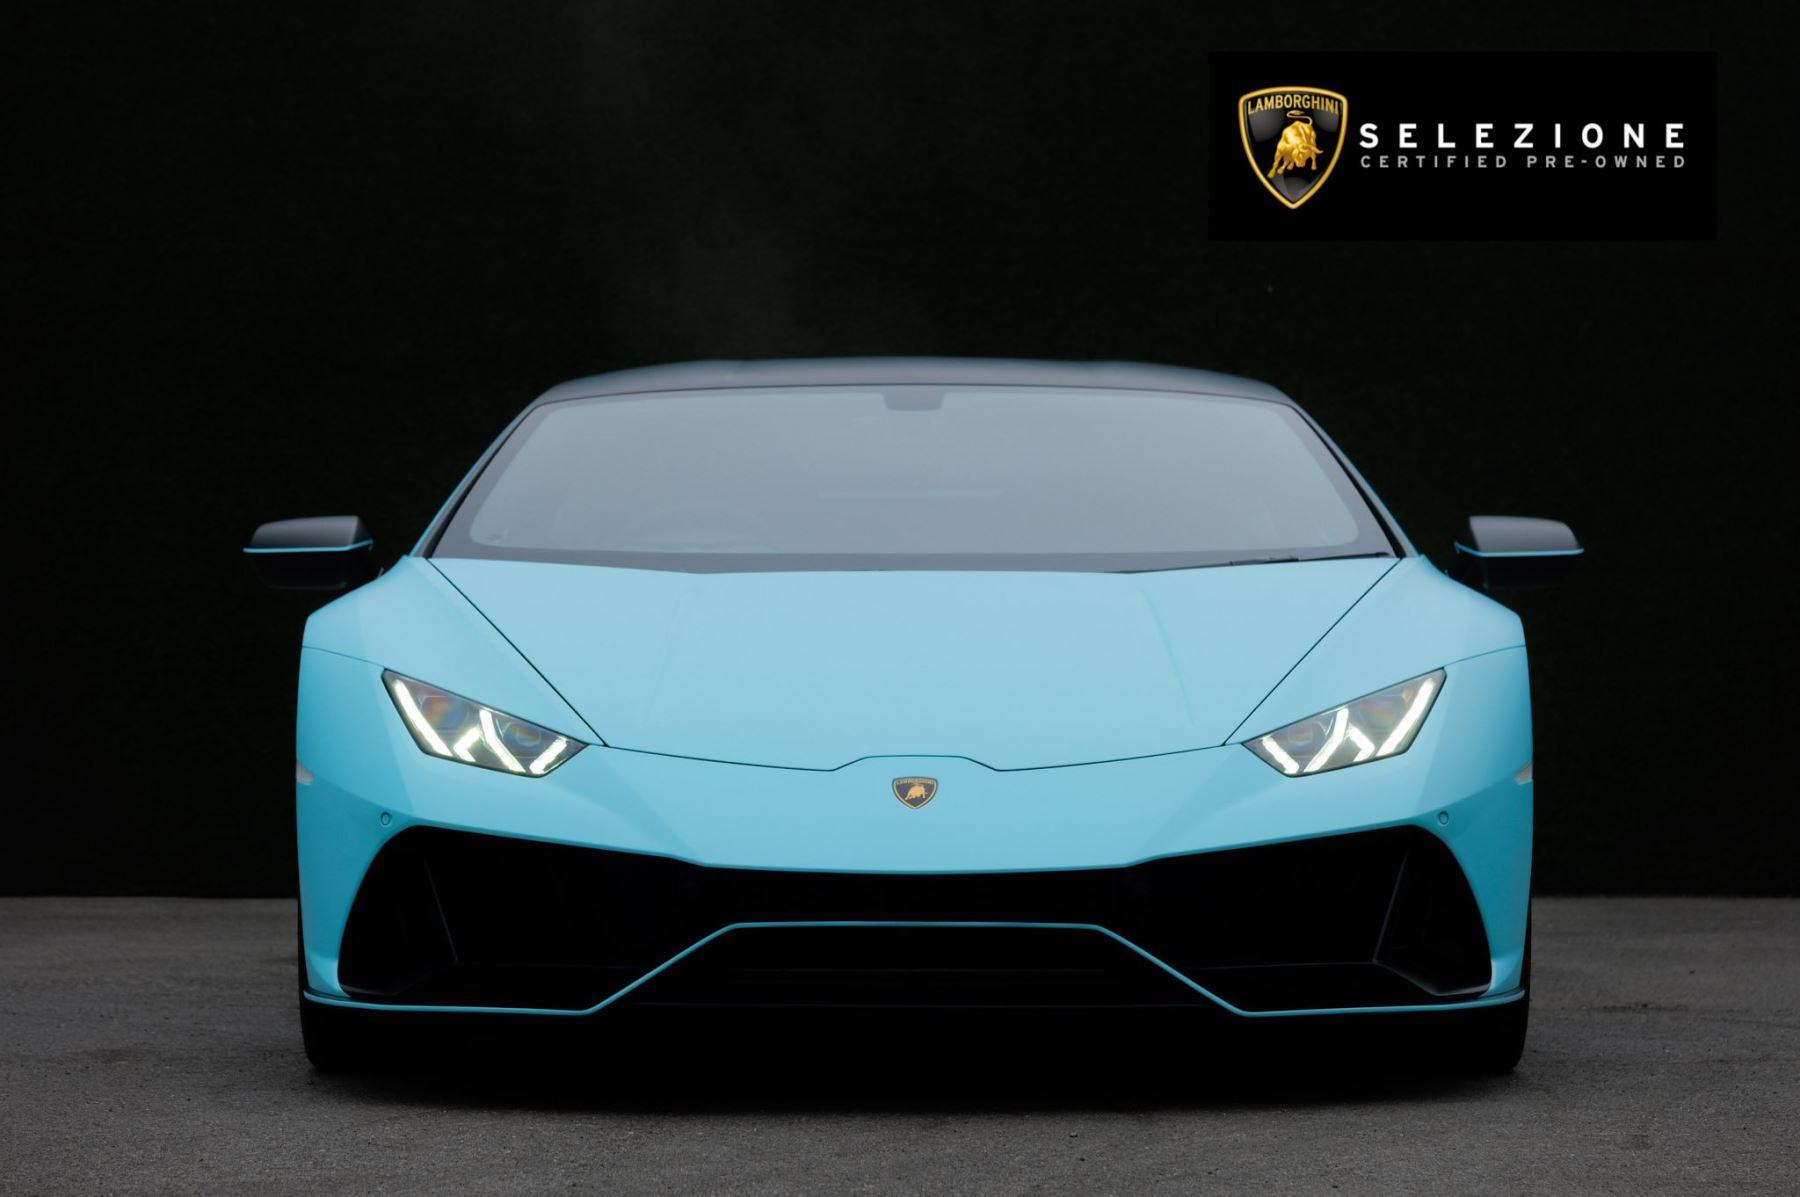 Lamborghini Huracan EVO Coupe image 5